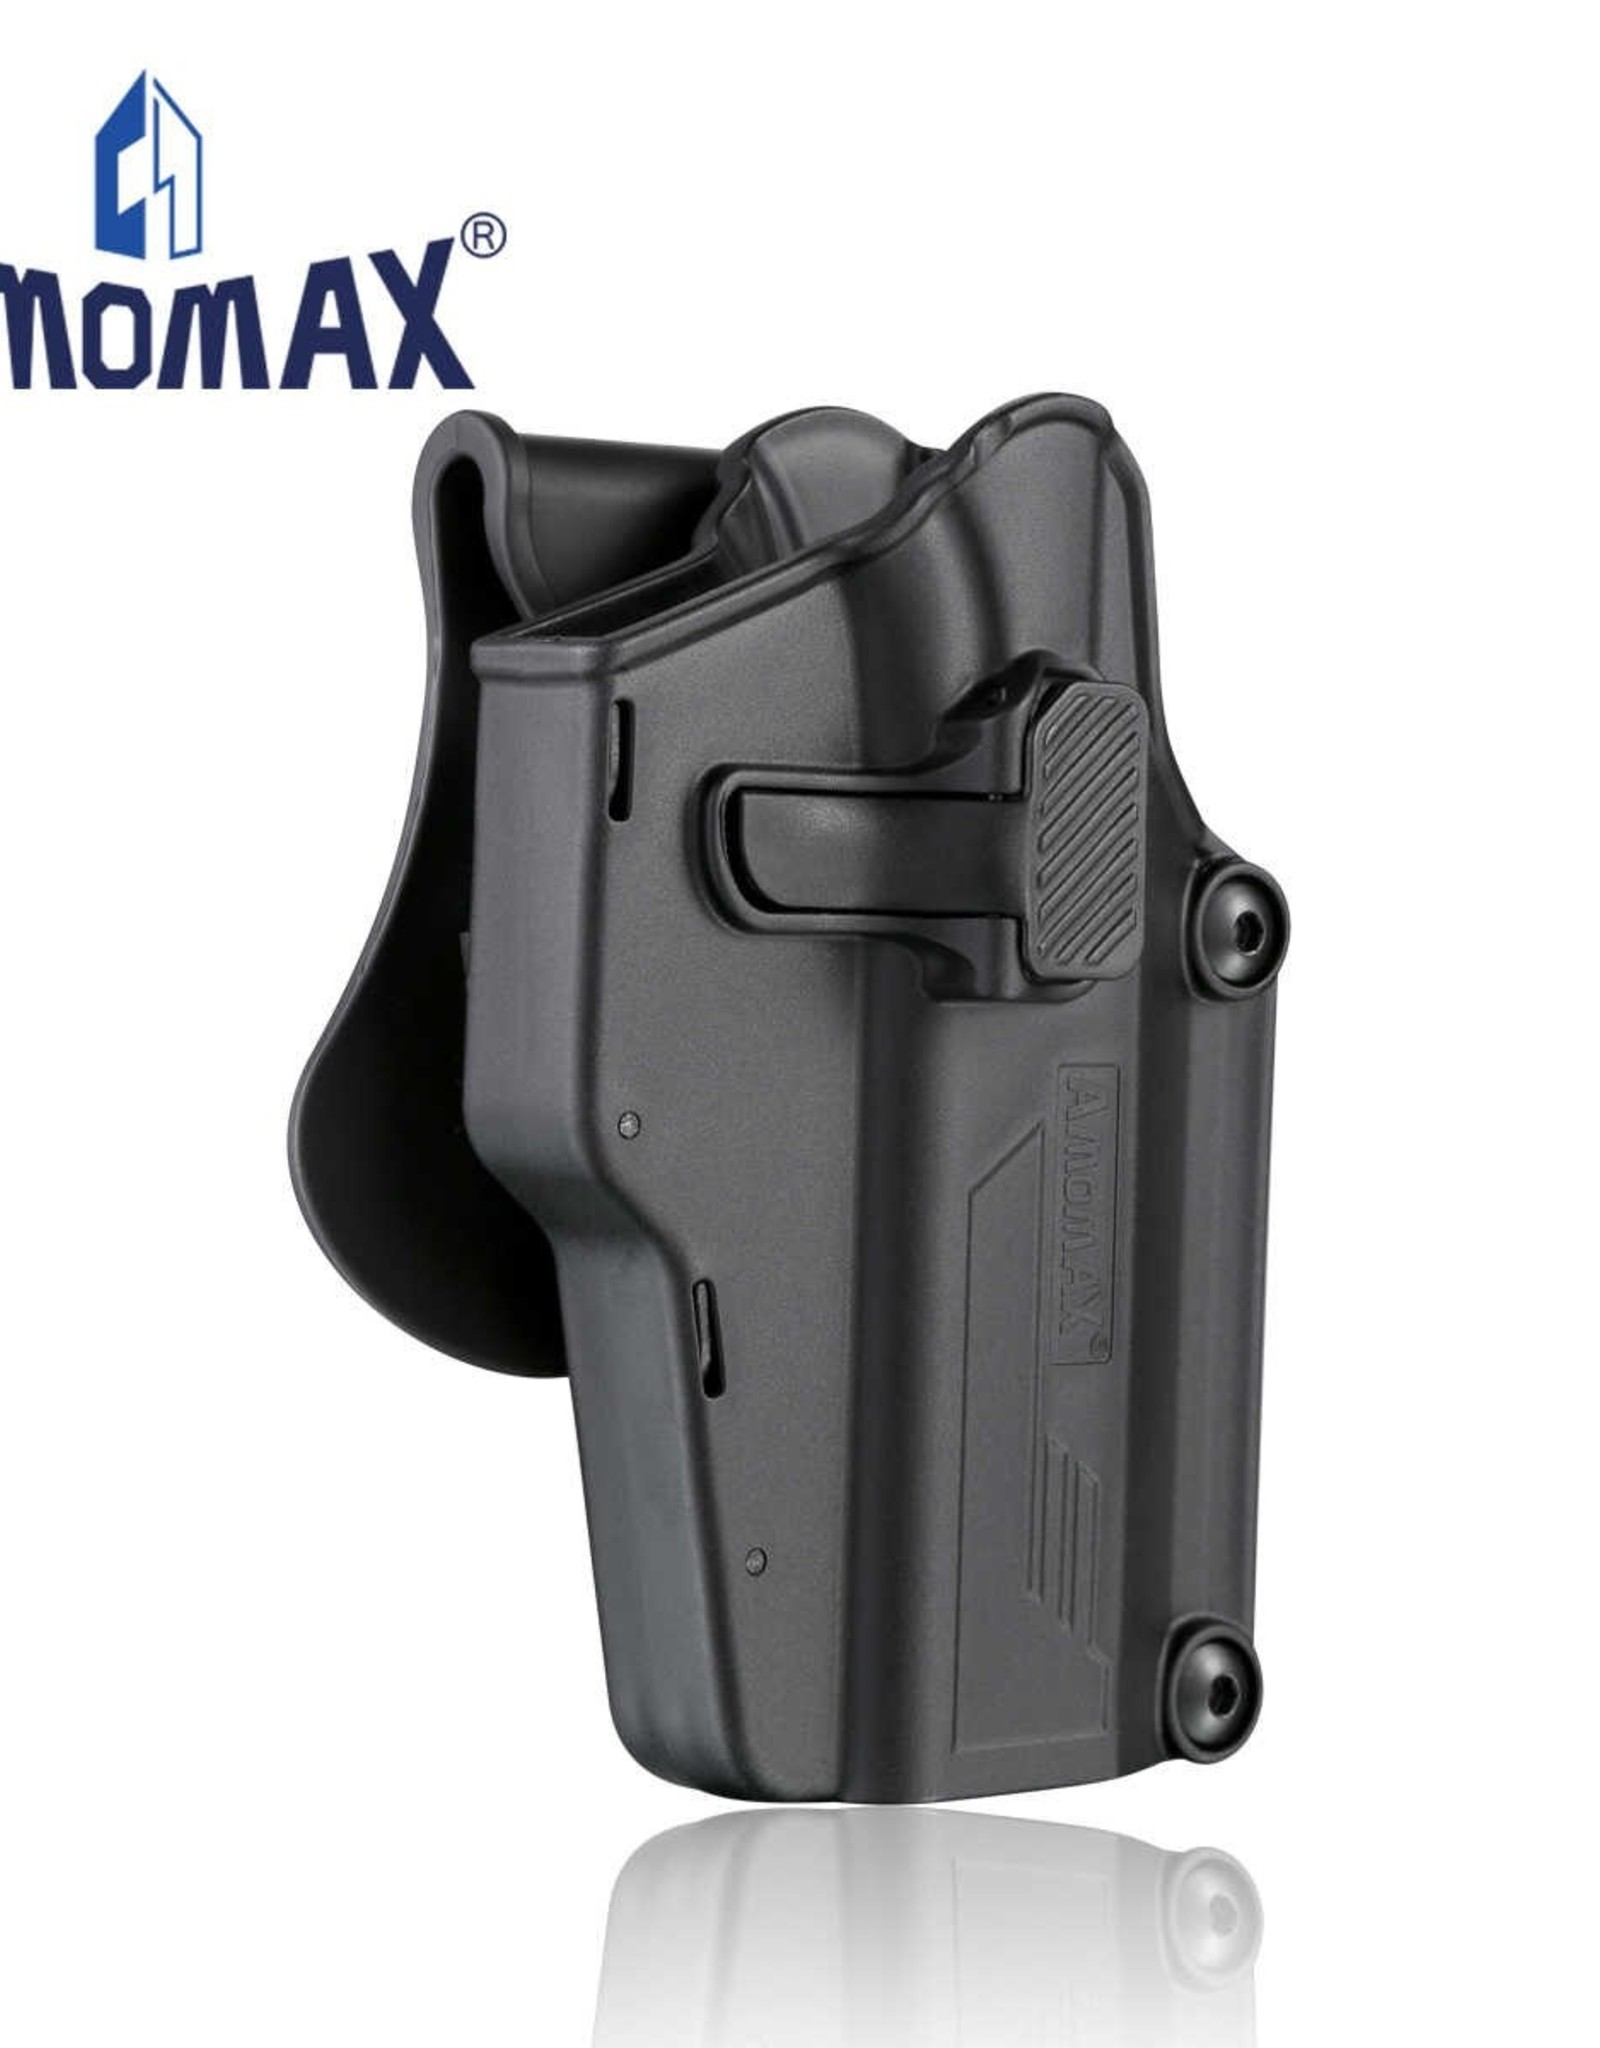 AMOMAX Amomax Per-fit Multi fit Adjustable Holster